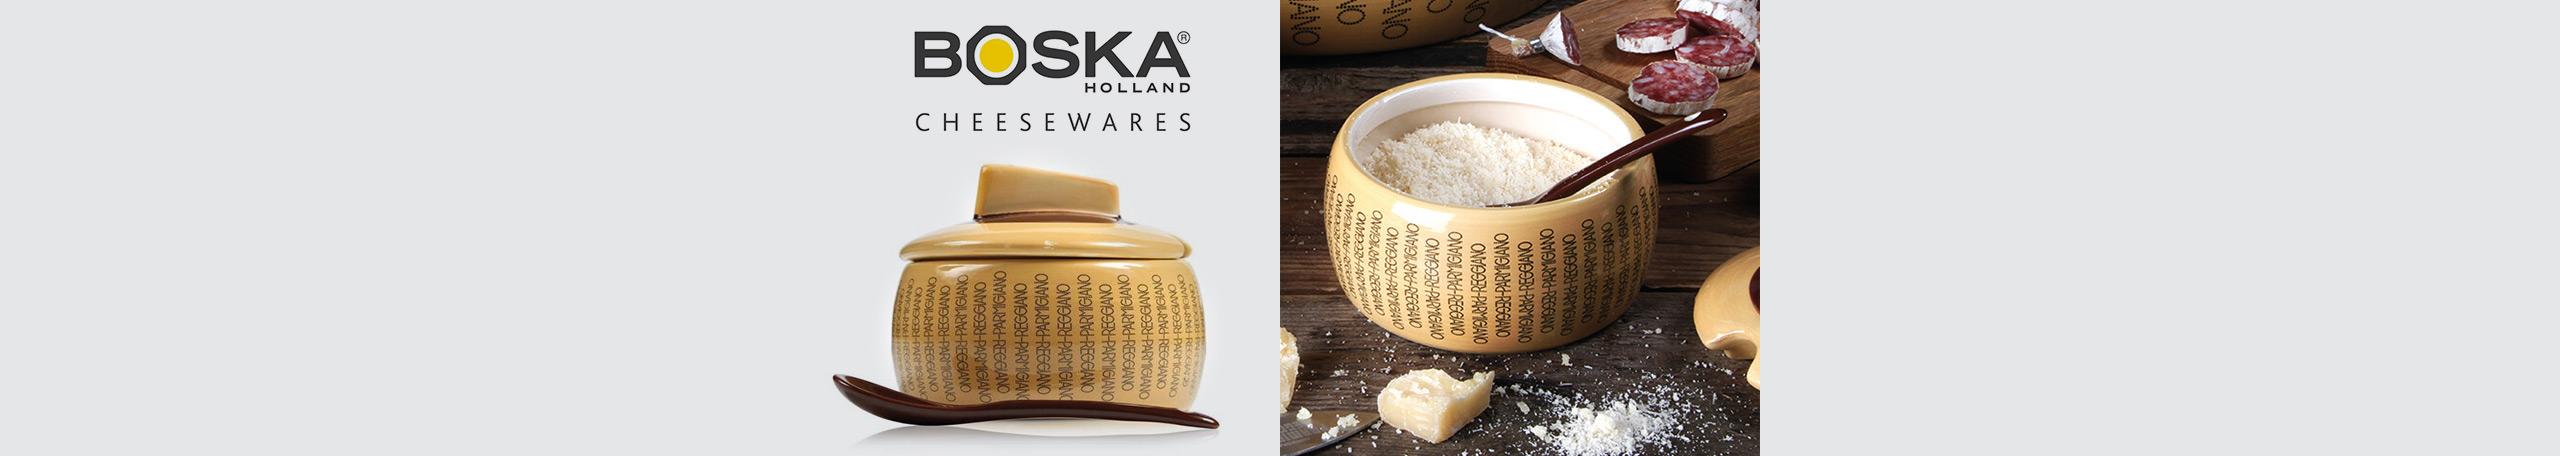 Boska Cheeseware